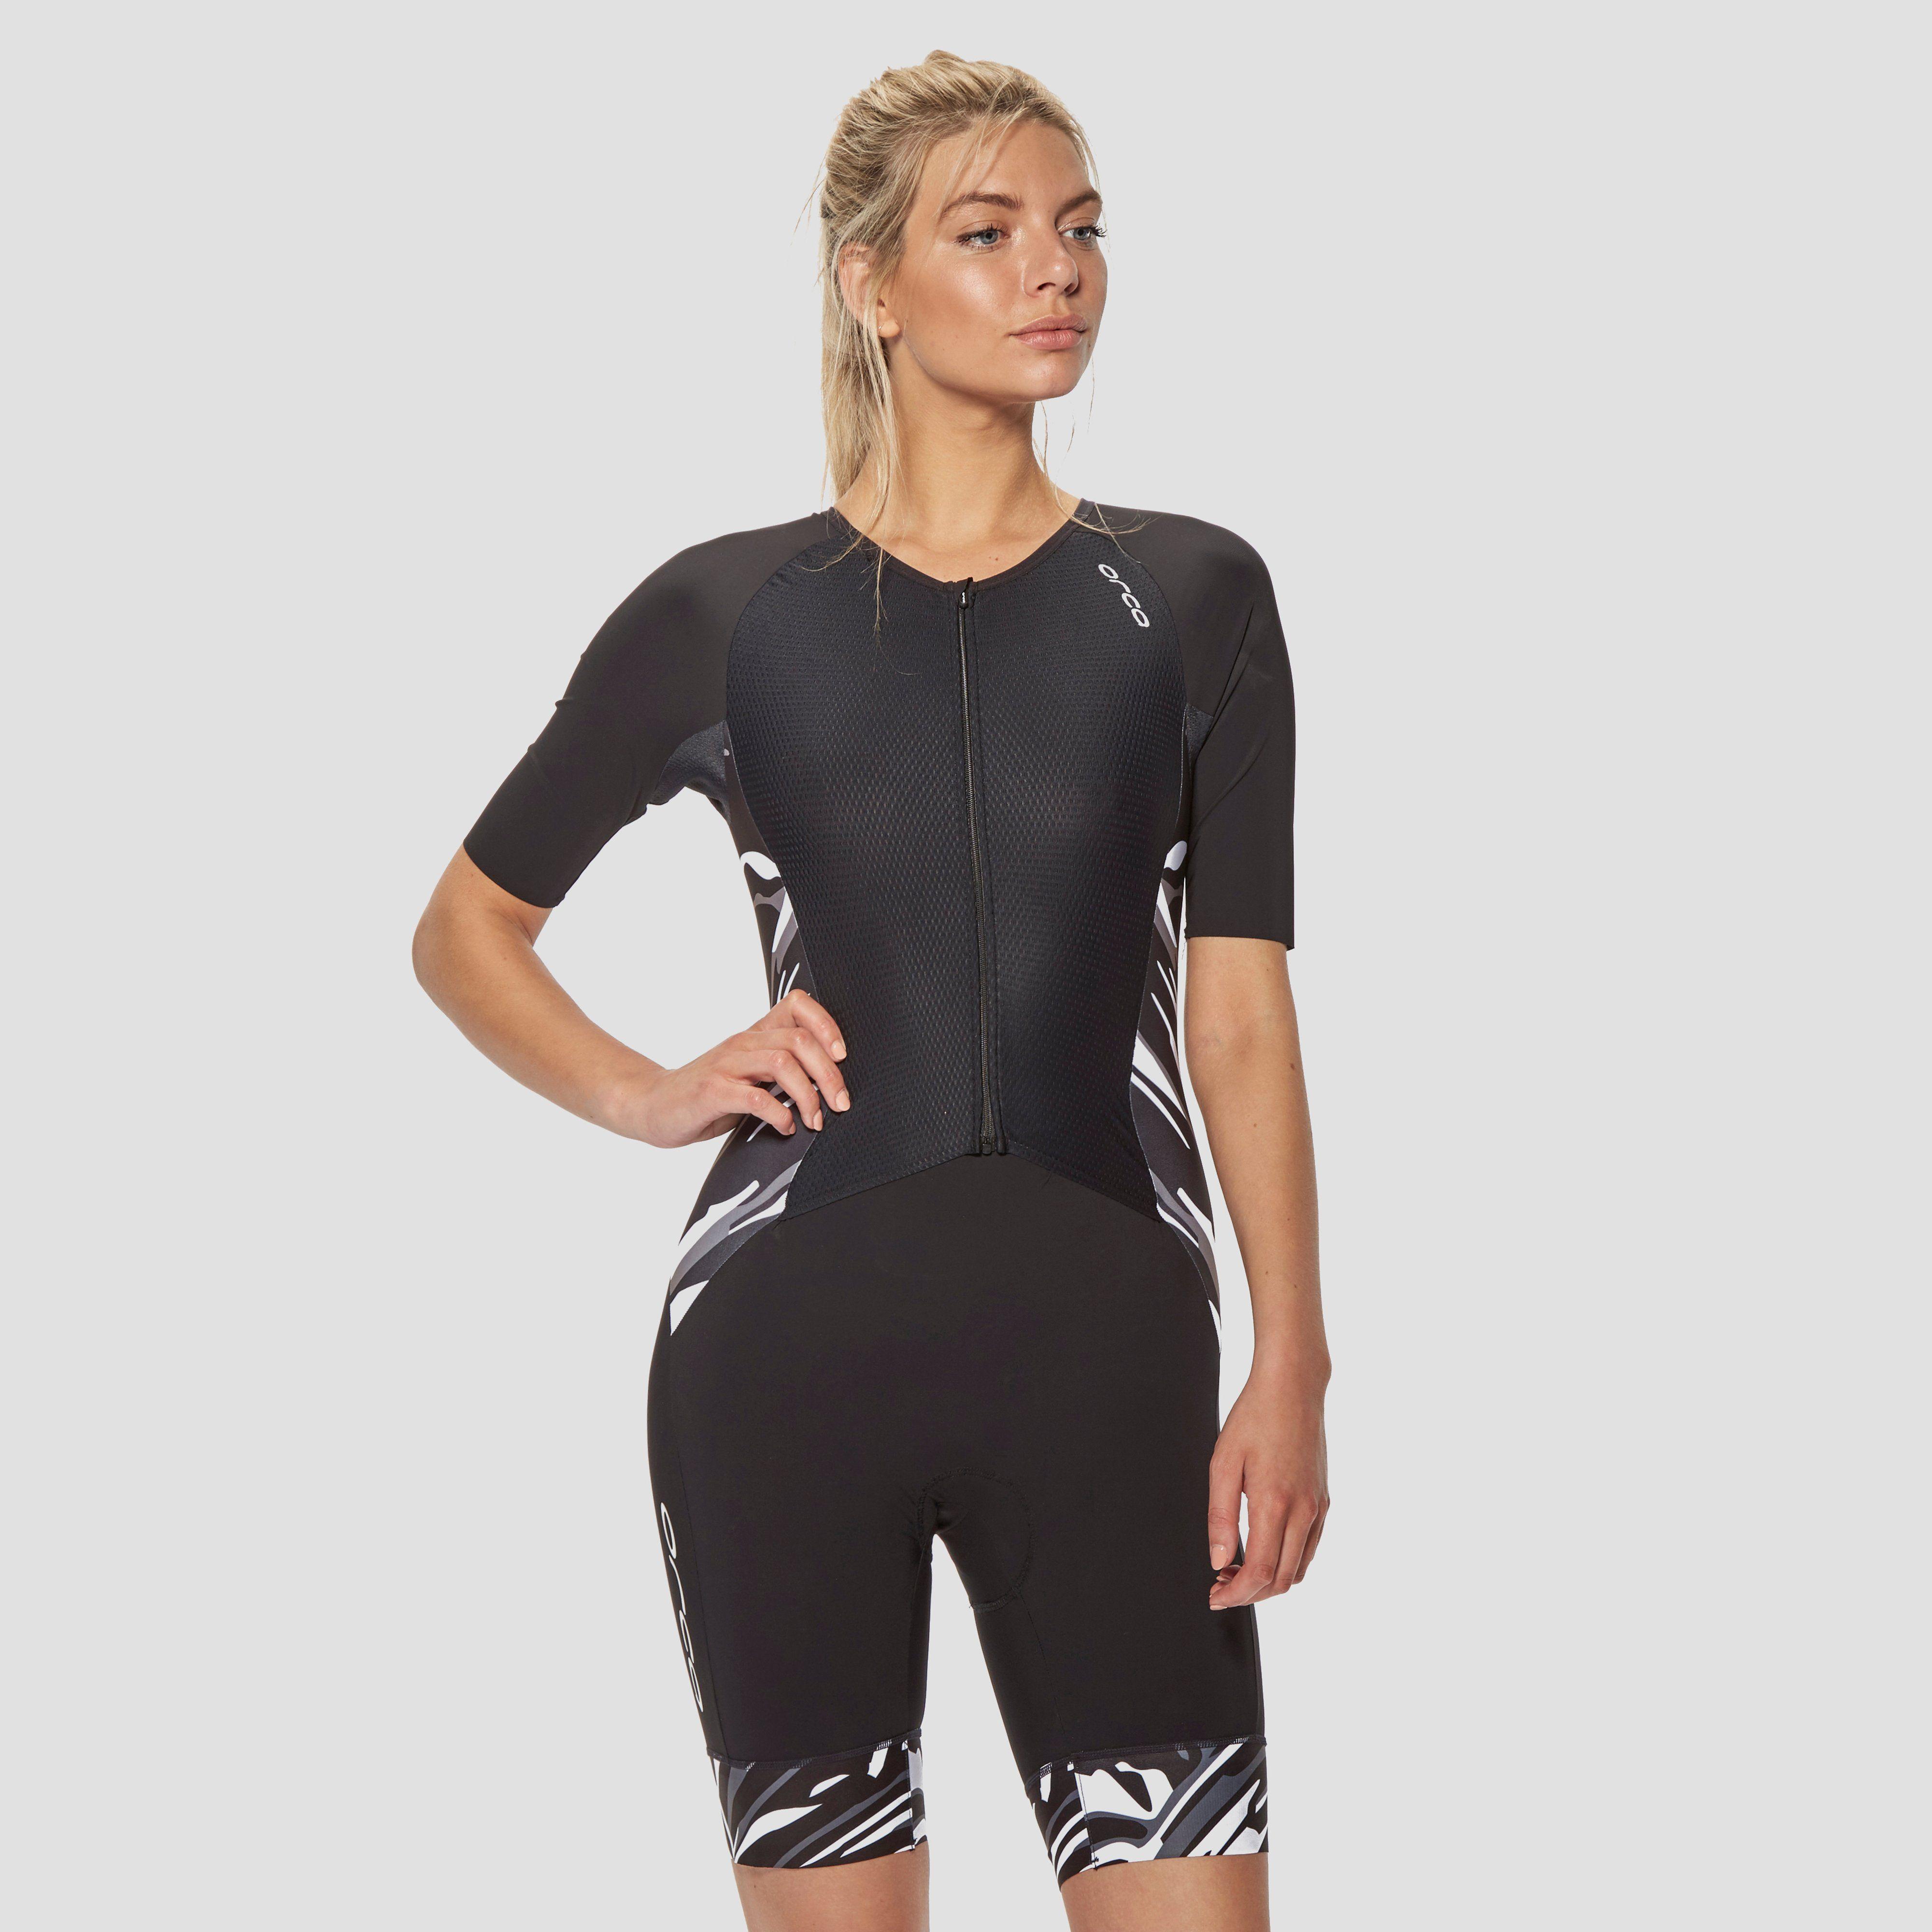 Orca Kompress SS Women's Race Suit